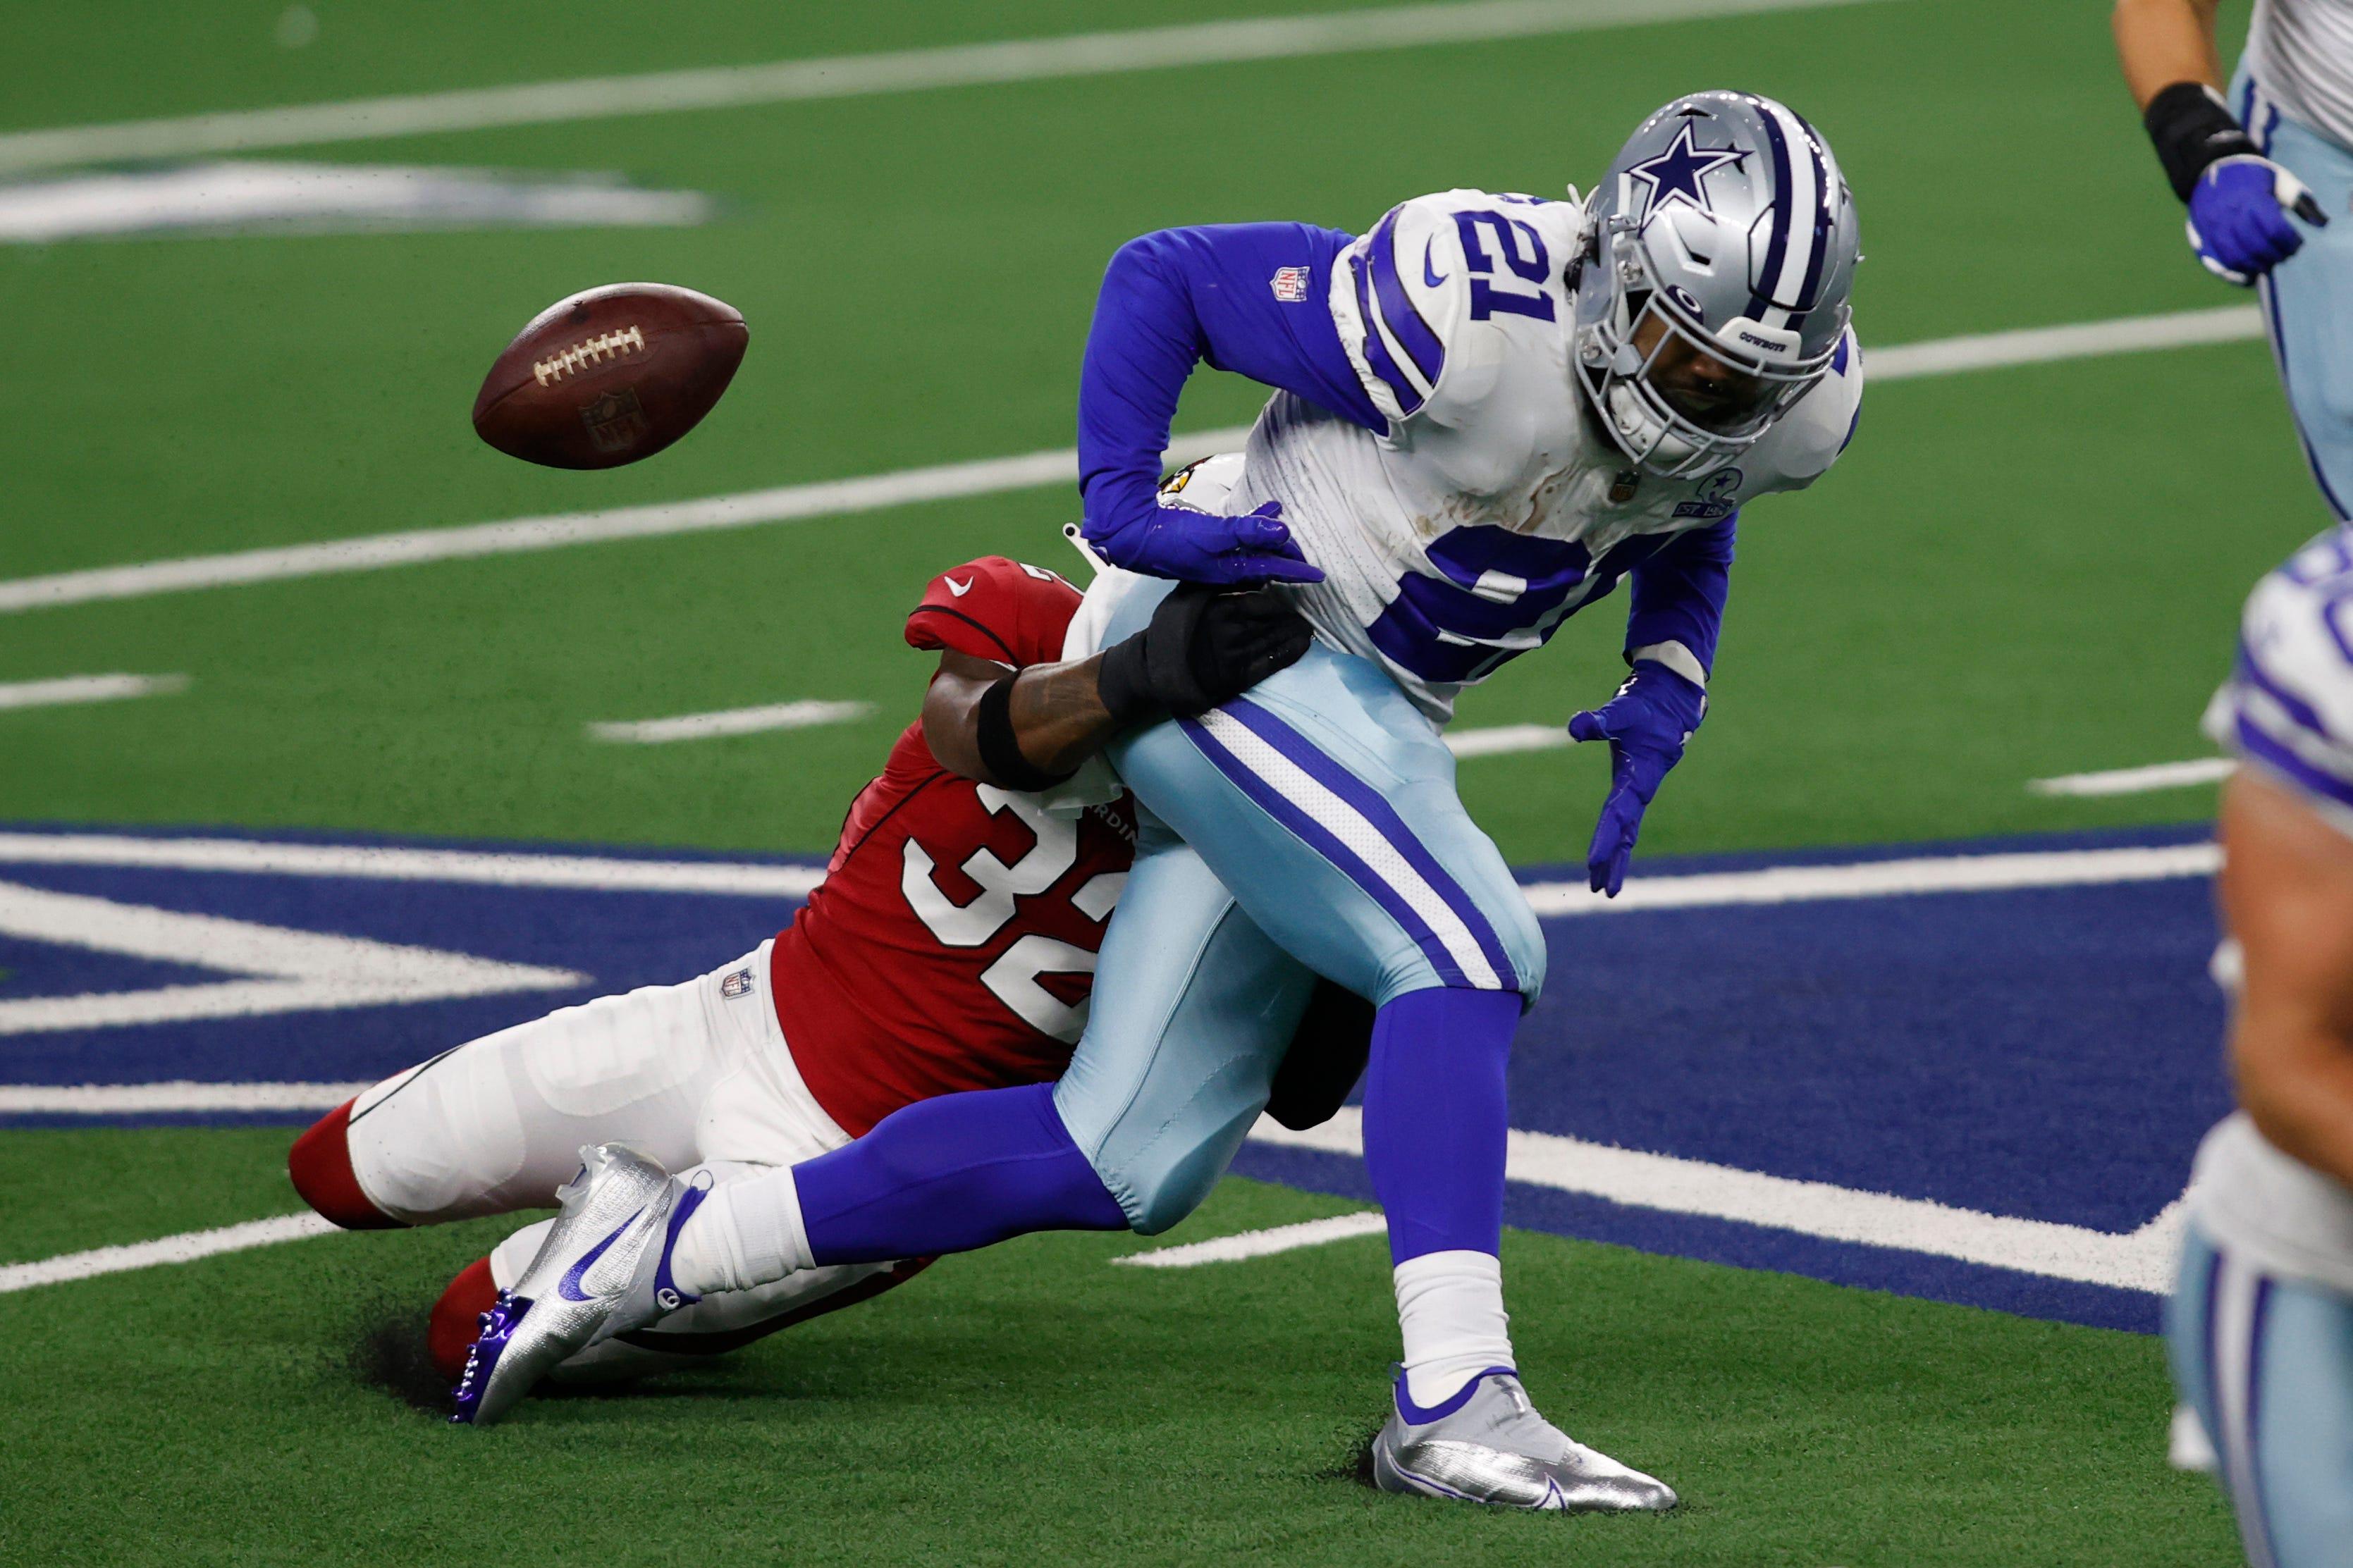 Ezekiel Elliott takes blame for fumbles, Cowboys' blowout loss: 'I want to say I'm sorry'